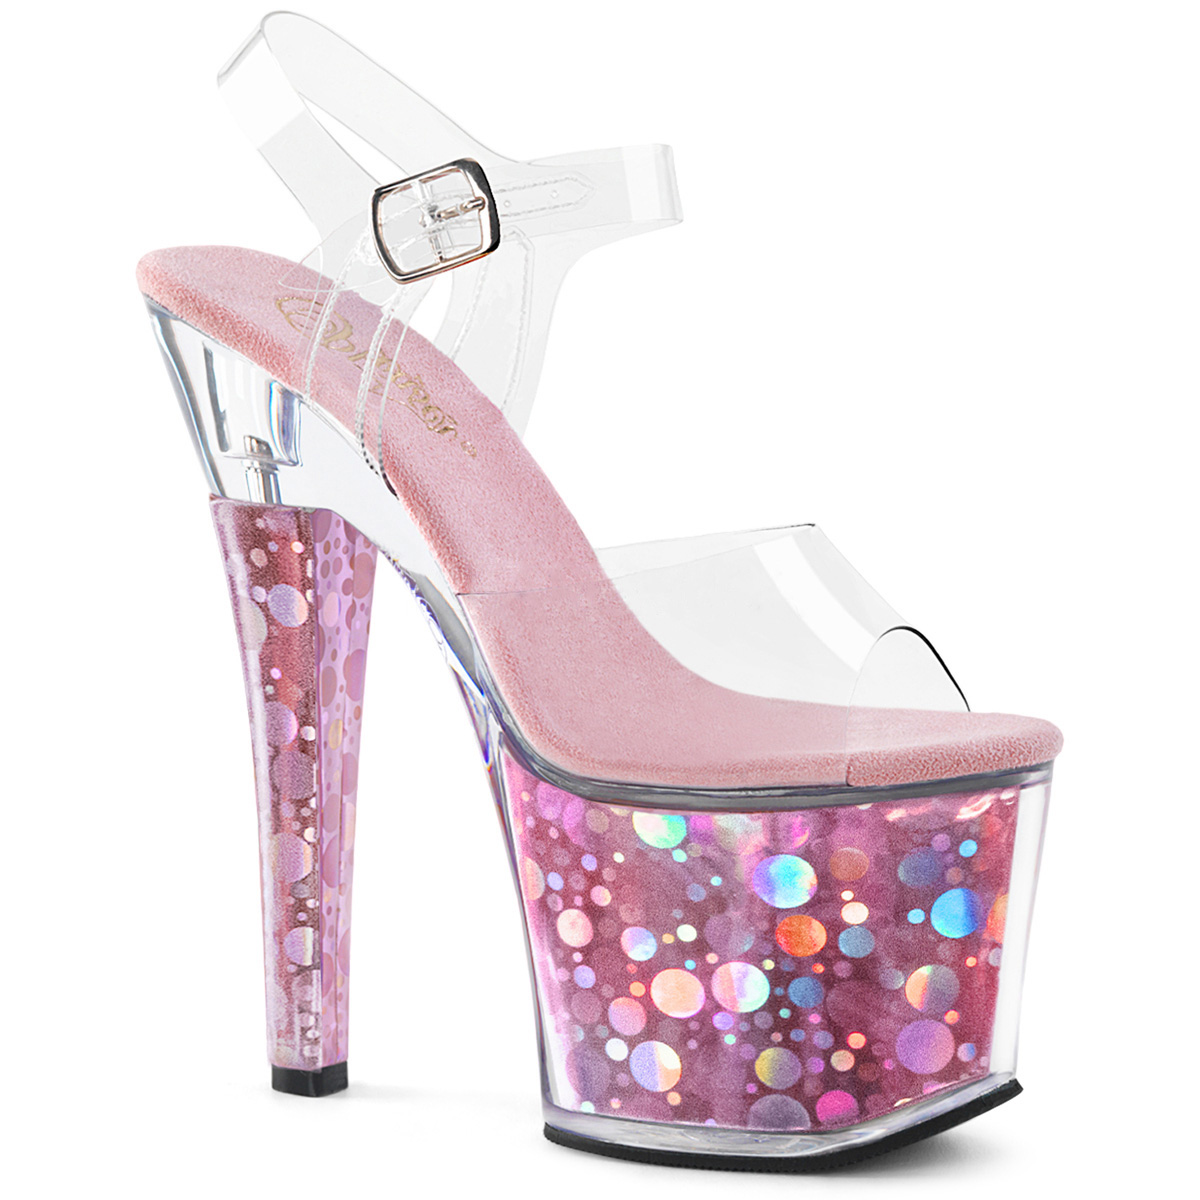 Sandalette Radiant Plateau Baby Pink 708bhg CdeWrxBoQ